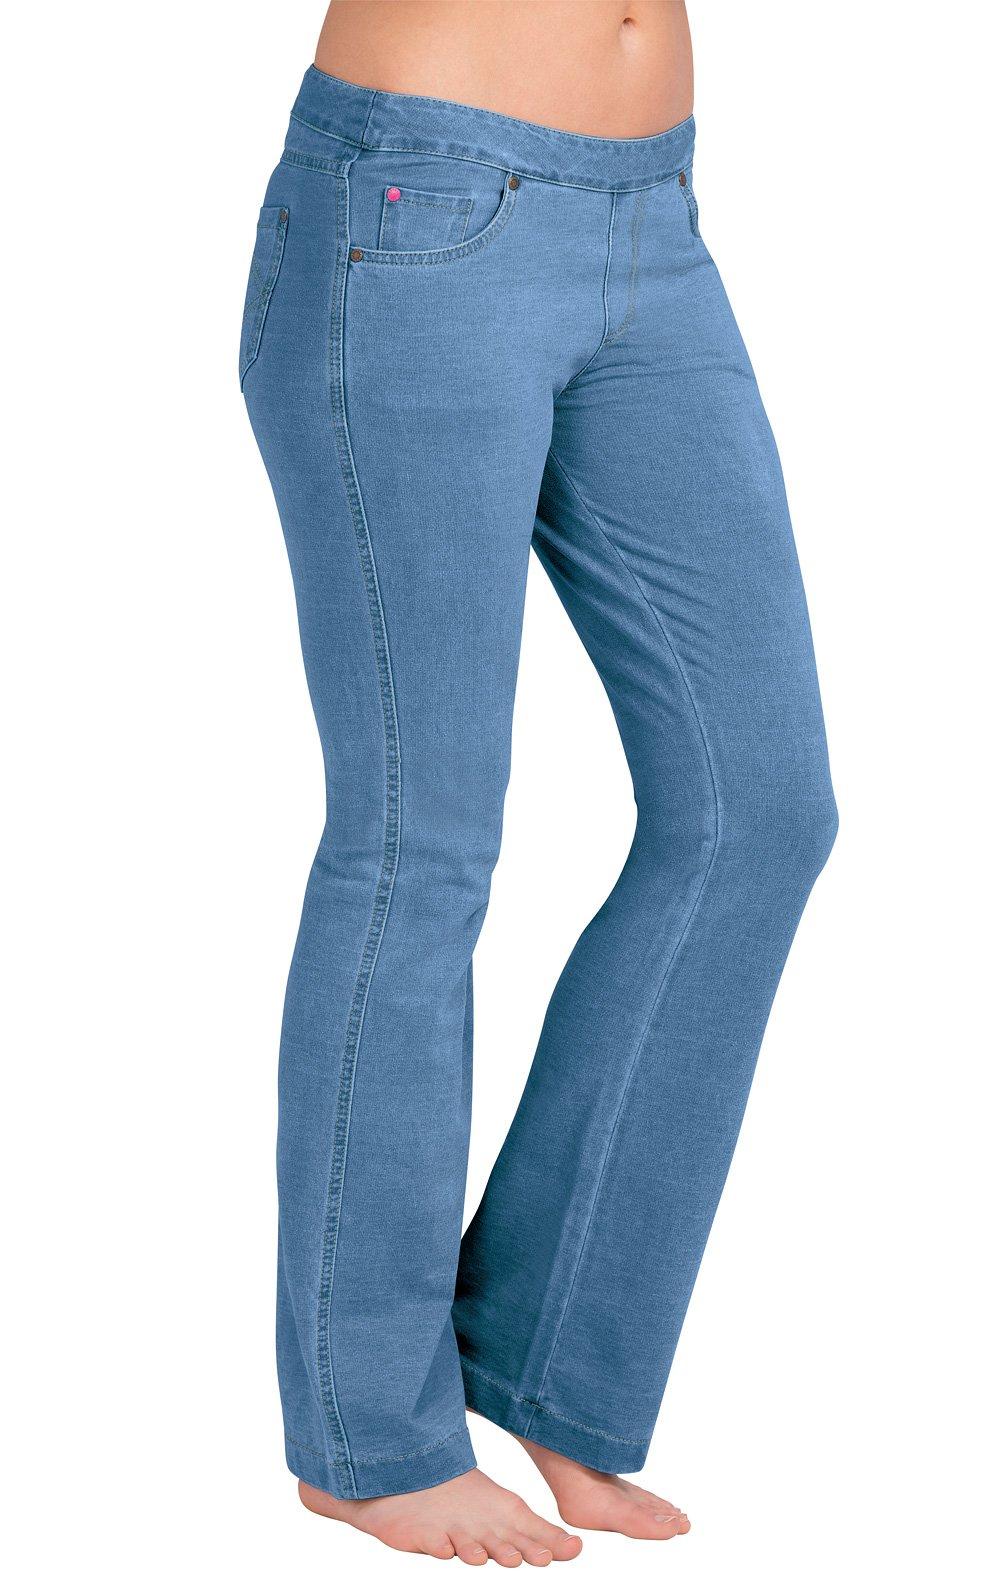 PajamaJeans Women's Petite Bootcut Stretch Denim Jeans, Bermuda, X-Large 16-18